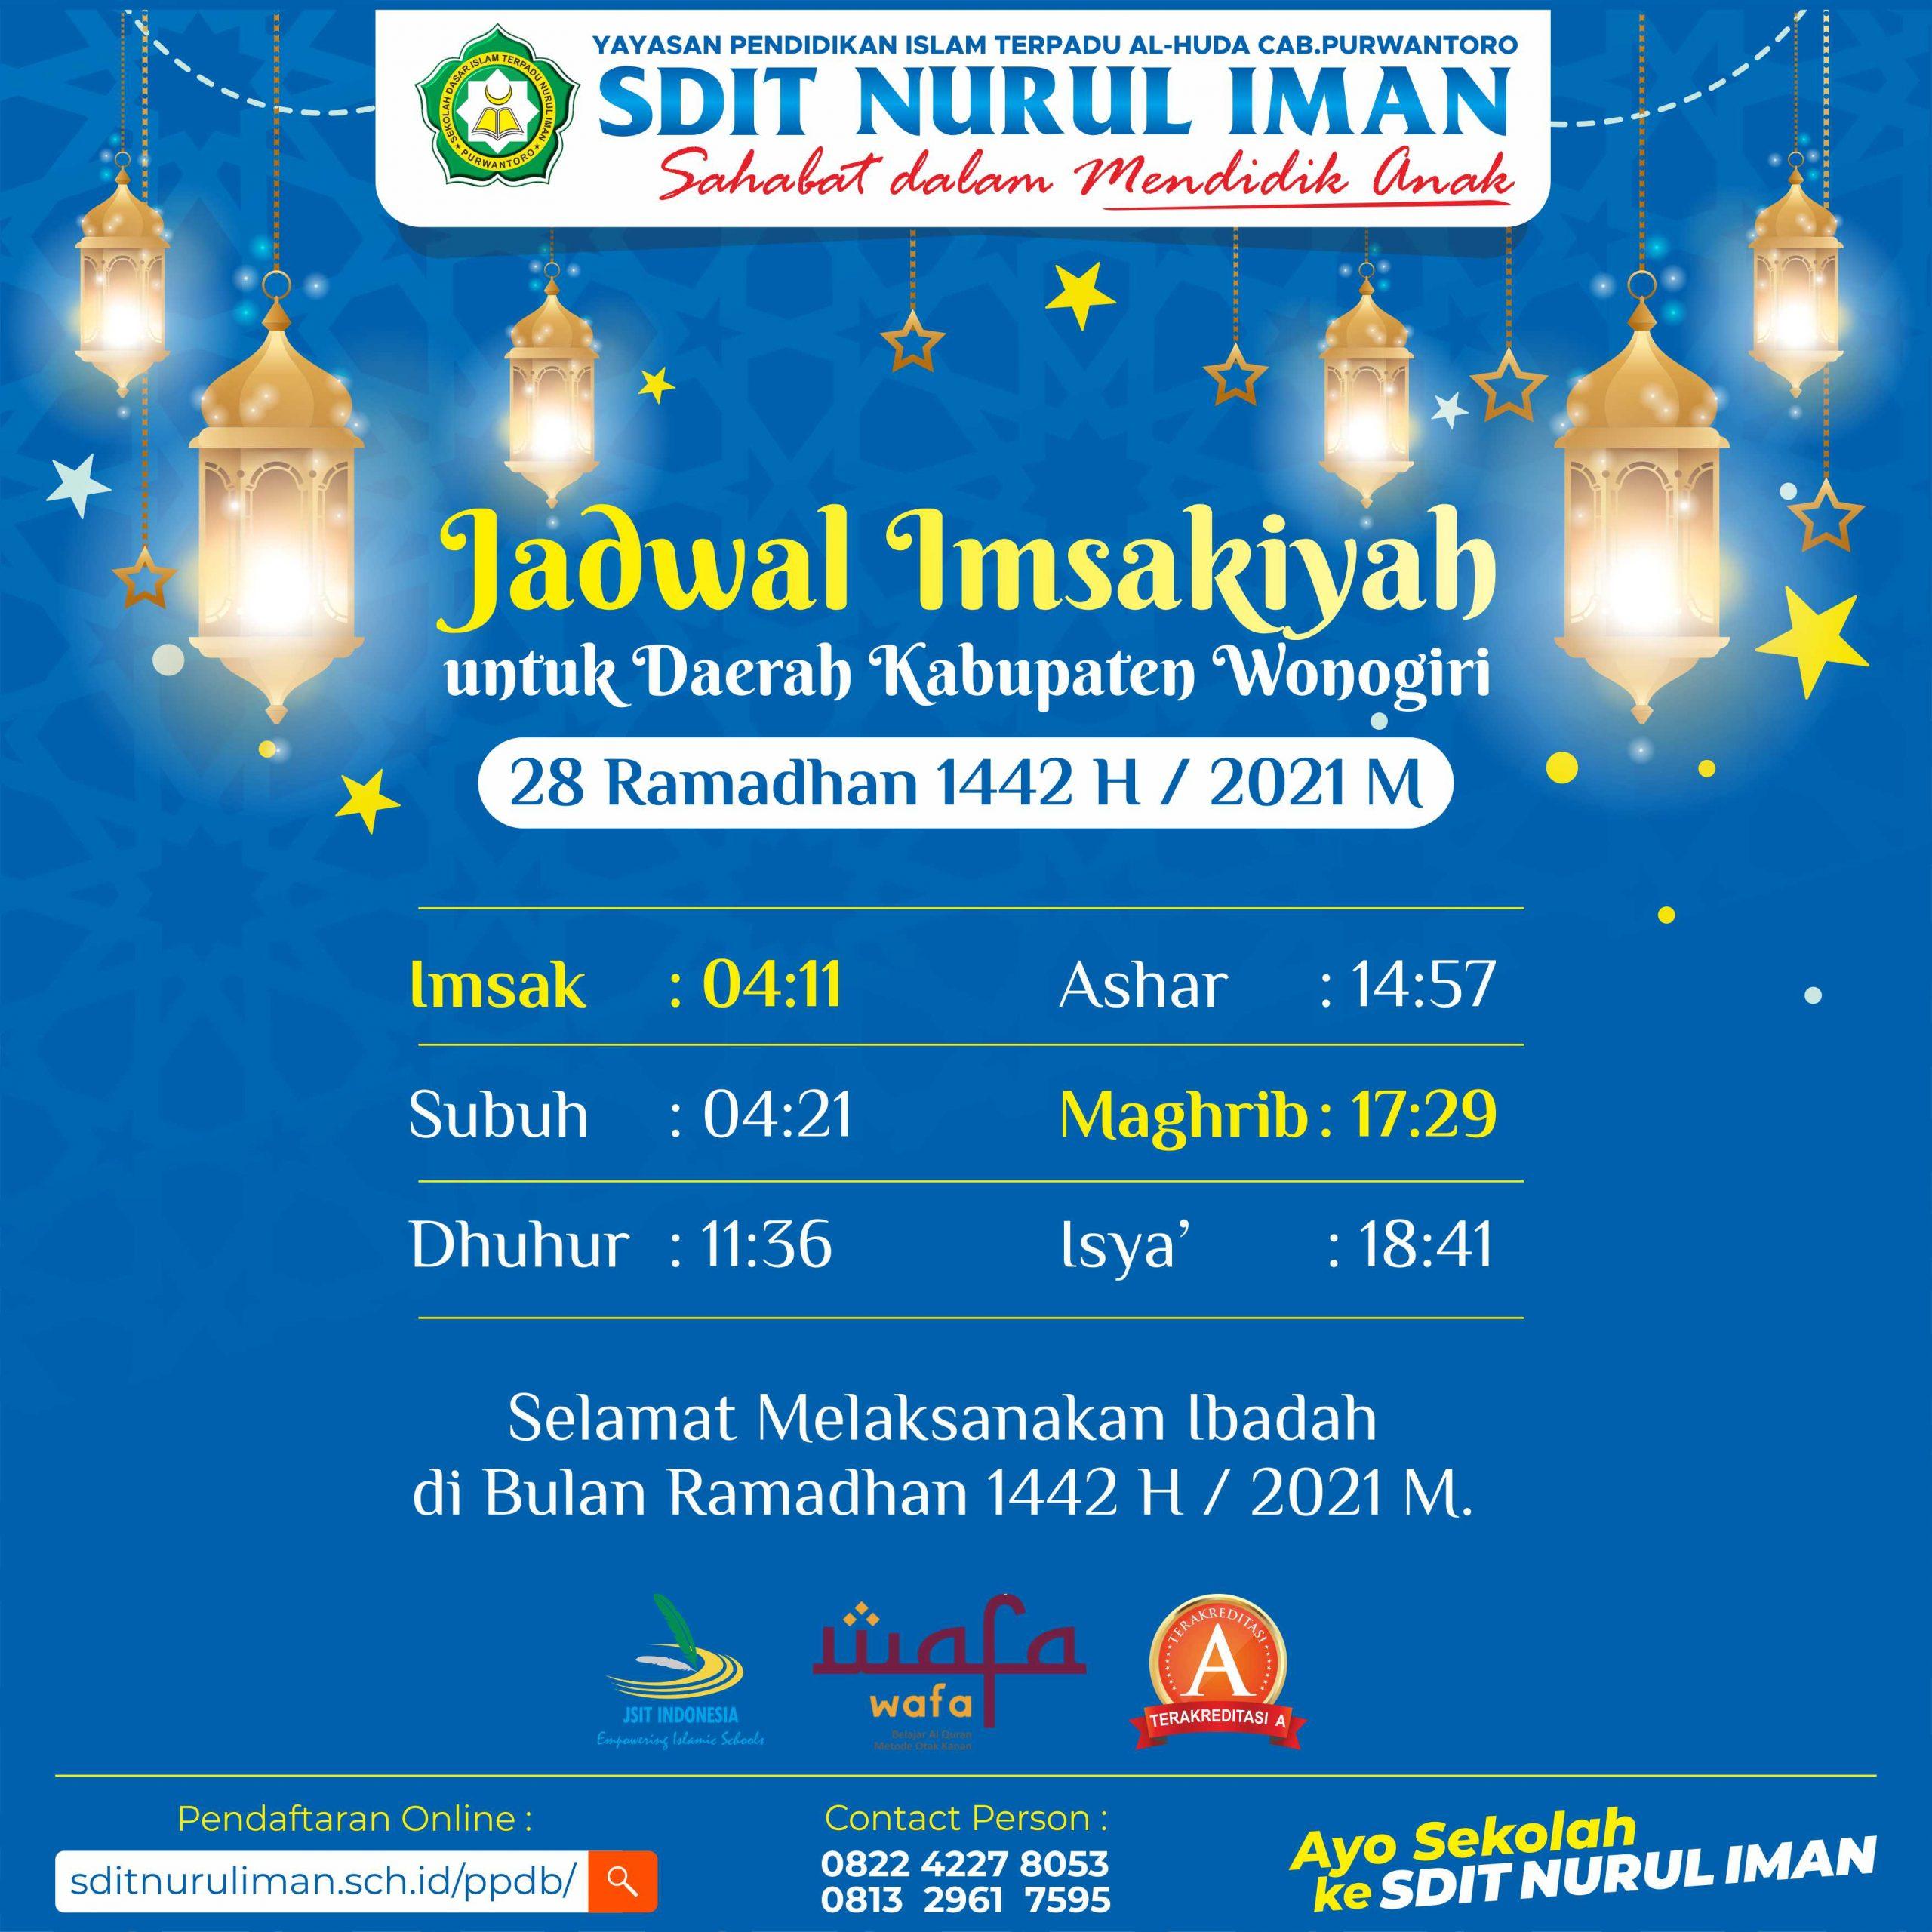 28 Ramadhan 1442 H